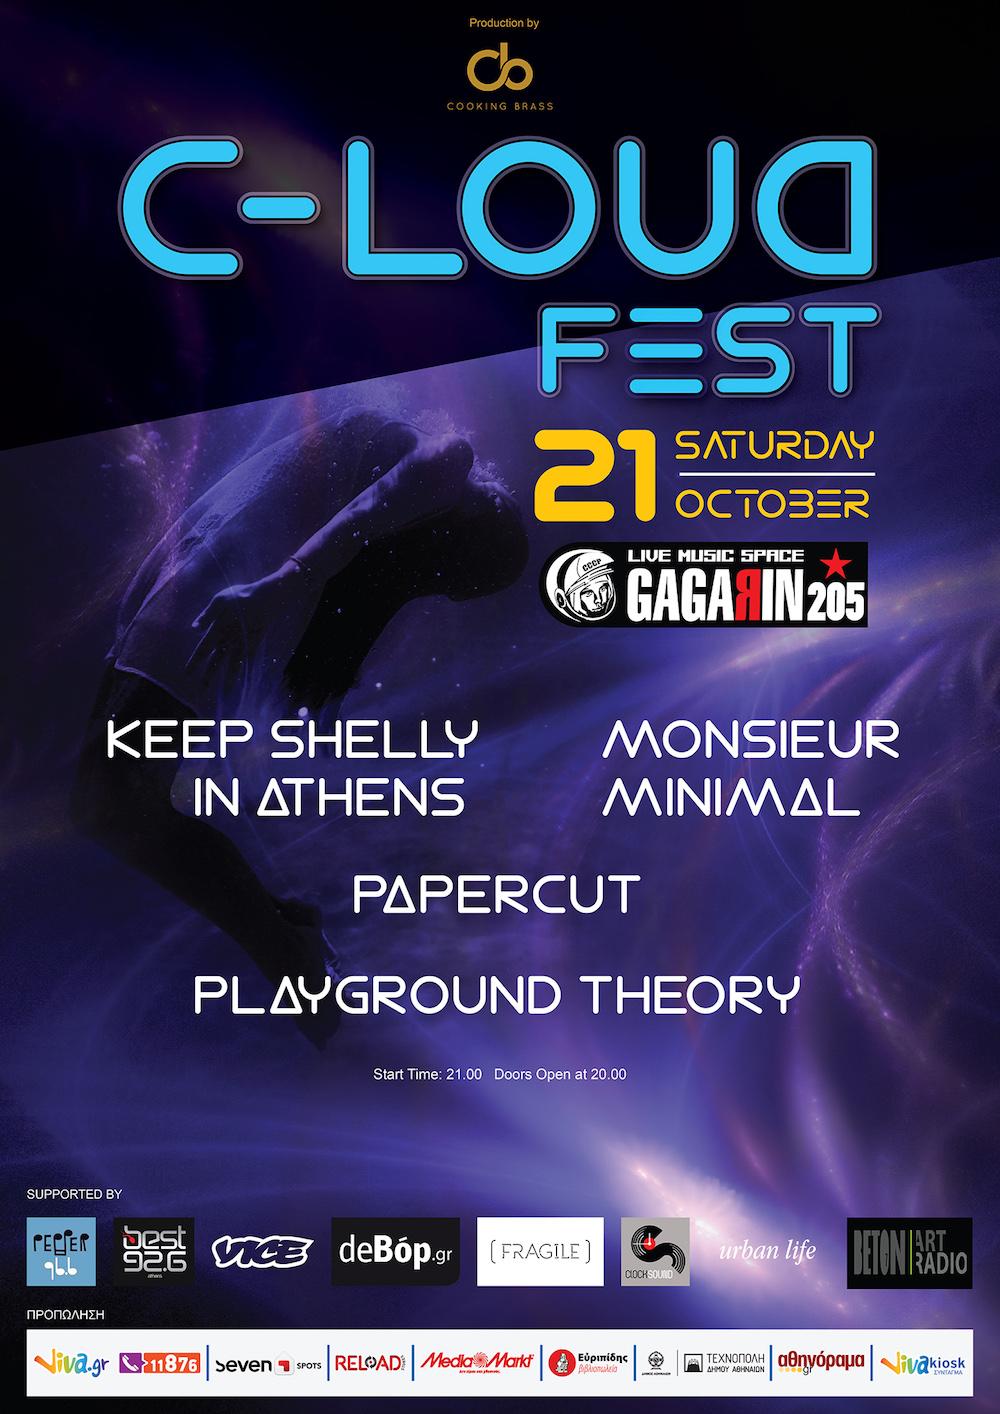 170903-c-loud-fest-gagarin-21-october-announcement-02